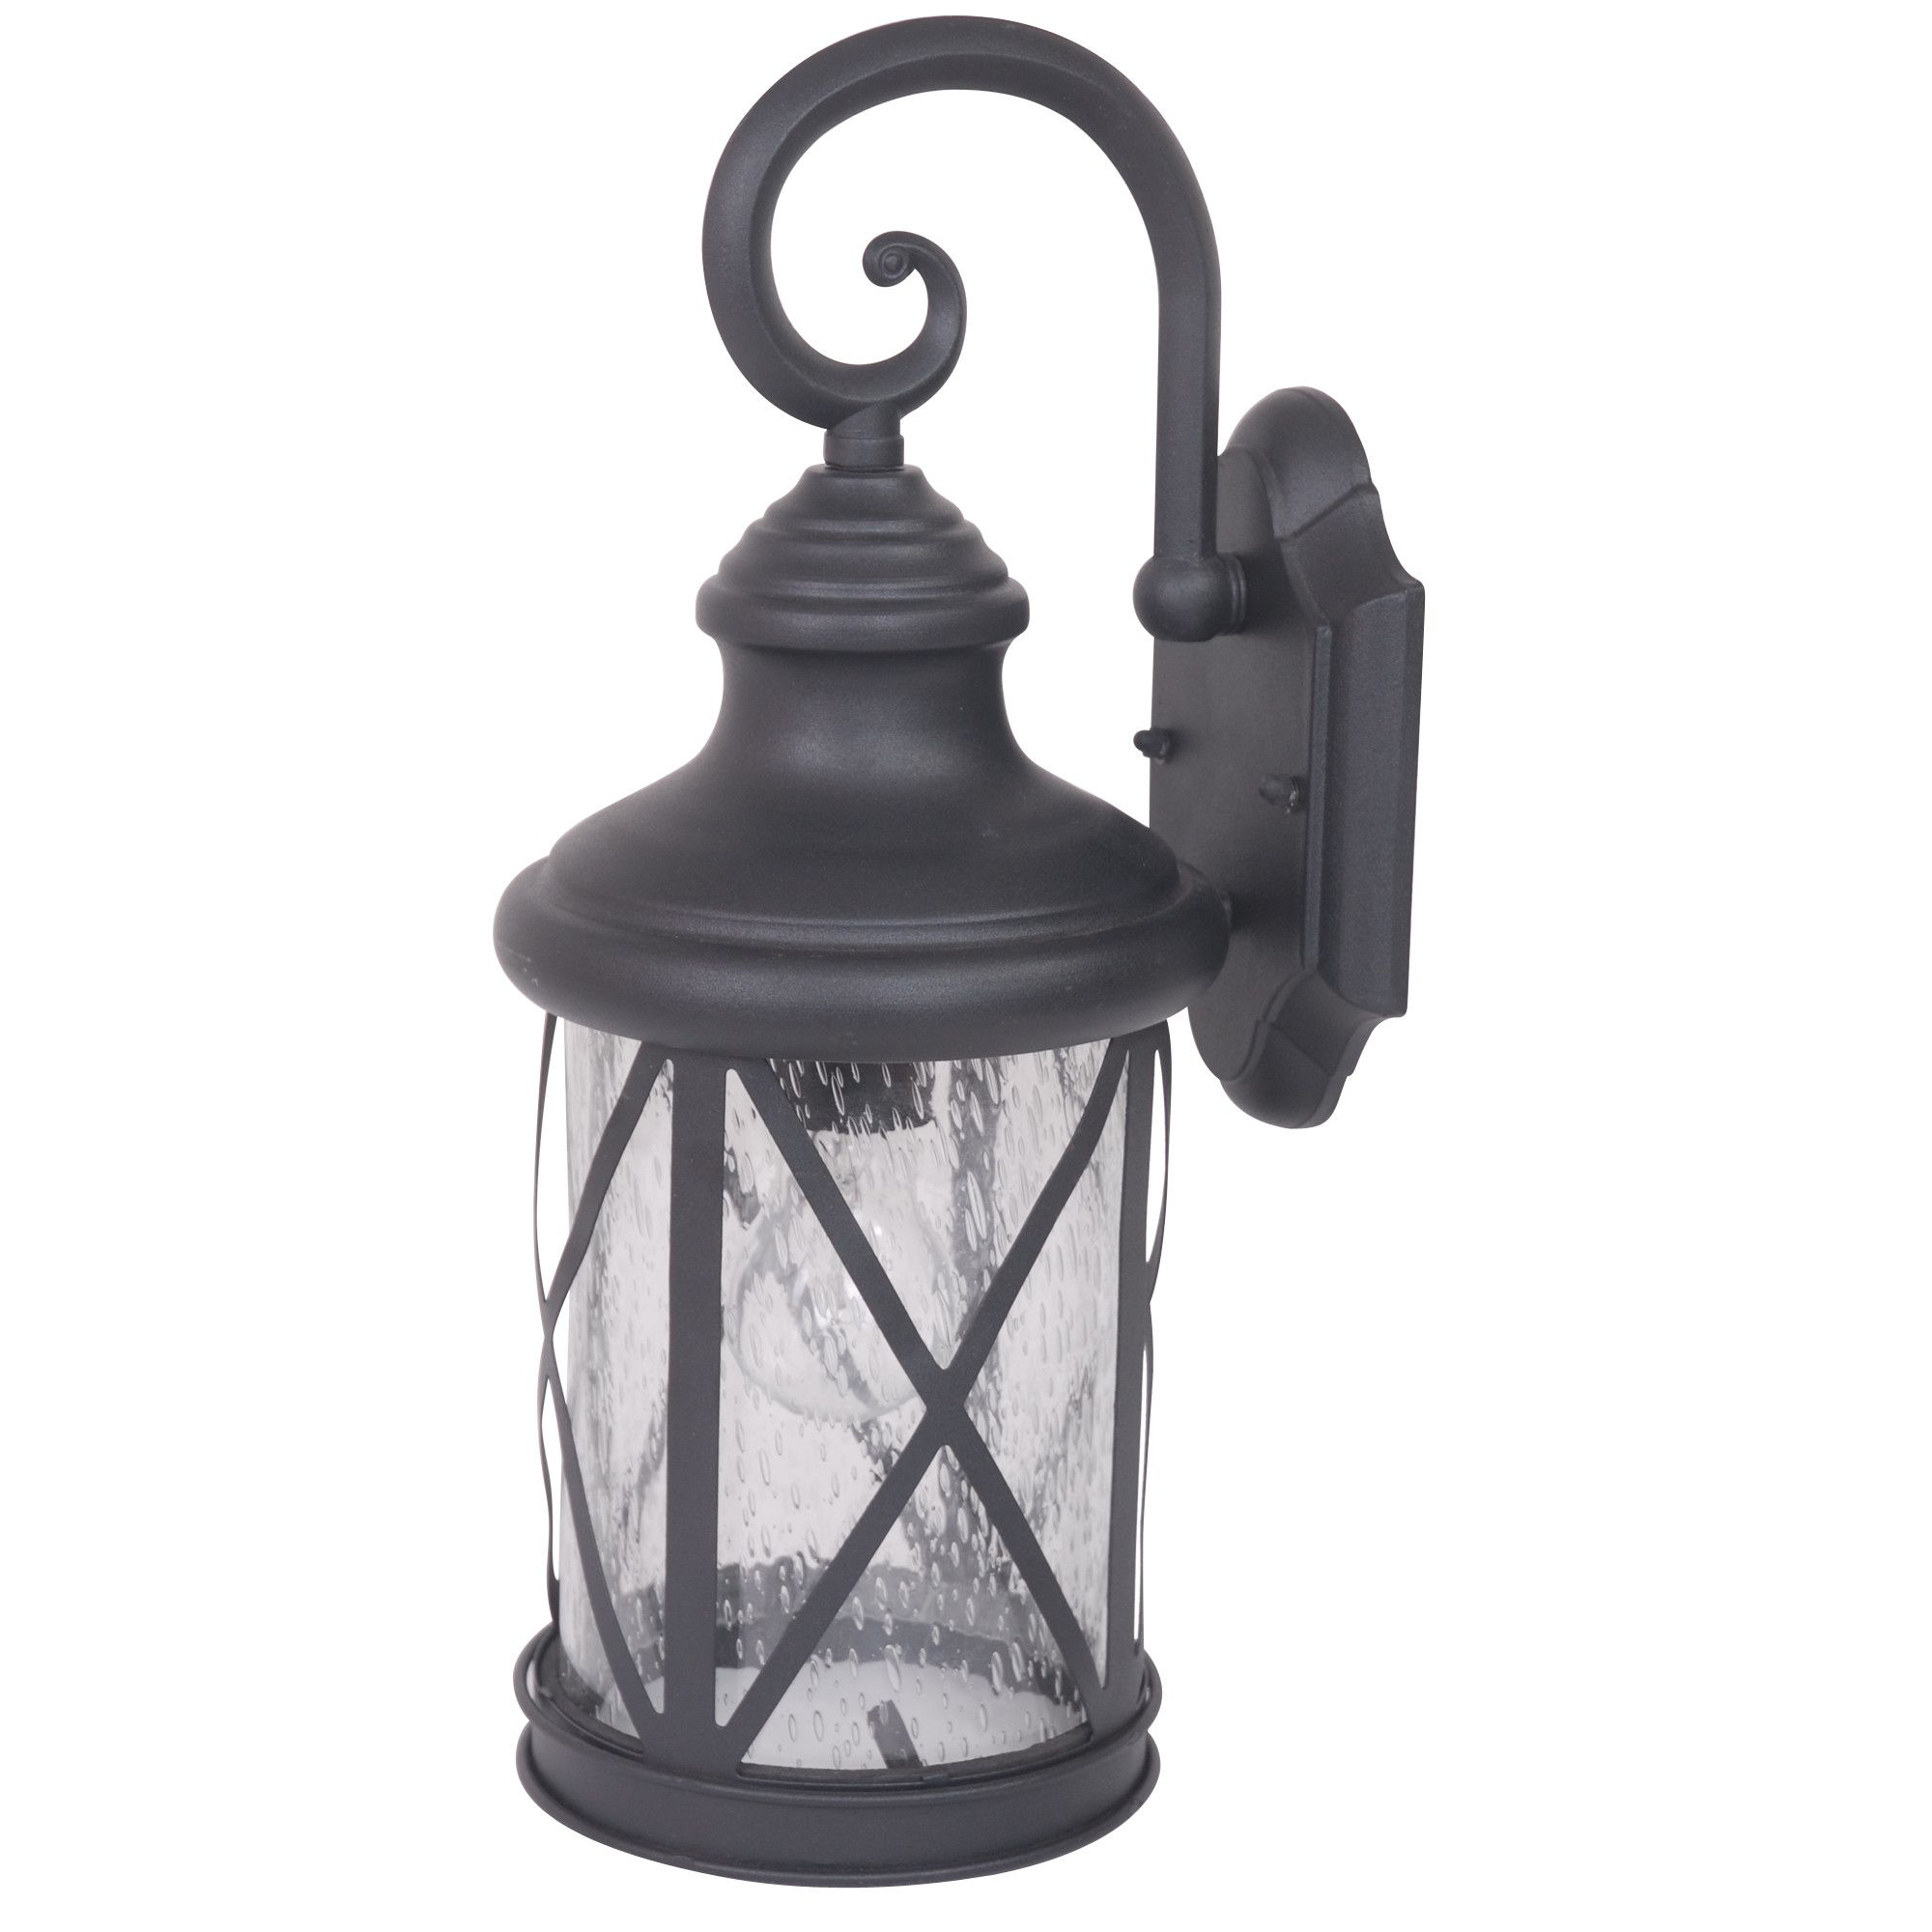 Customer Image Zoomed Outdoor wall lantern